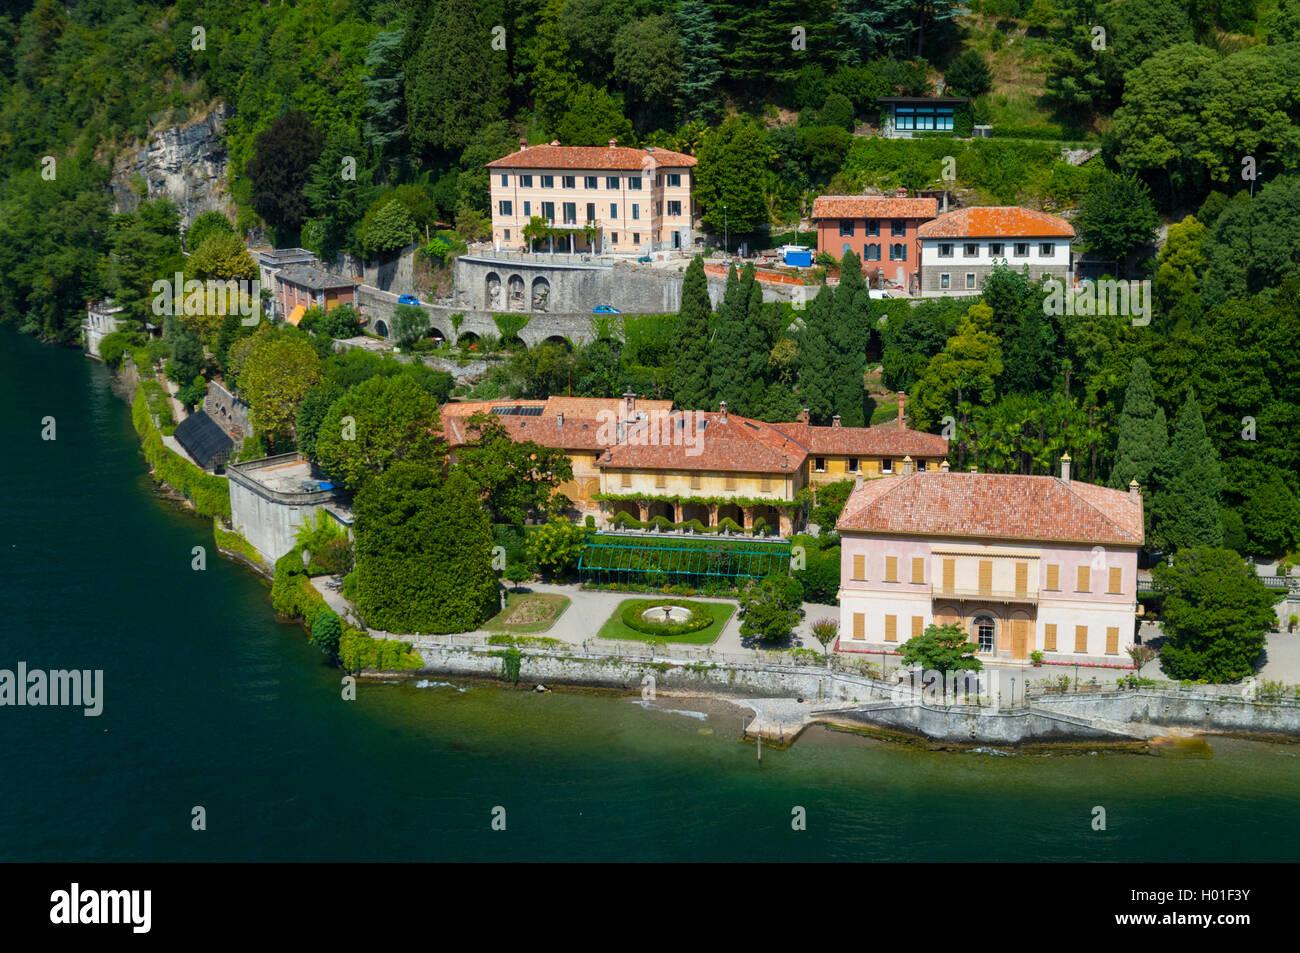 Exceptionnel Italie, Lombardie, lac de Come, Cernobbio, villa Pizzo (vue Stock  EF13